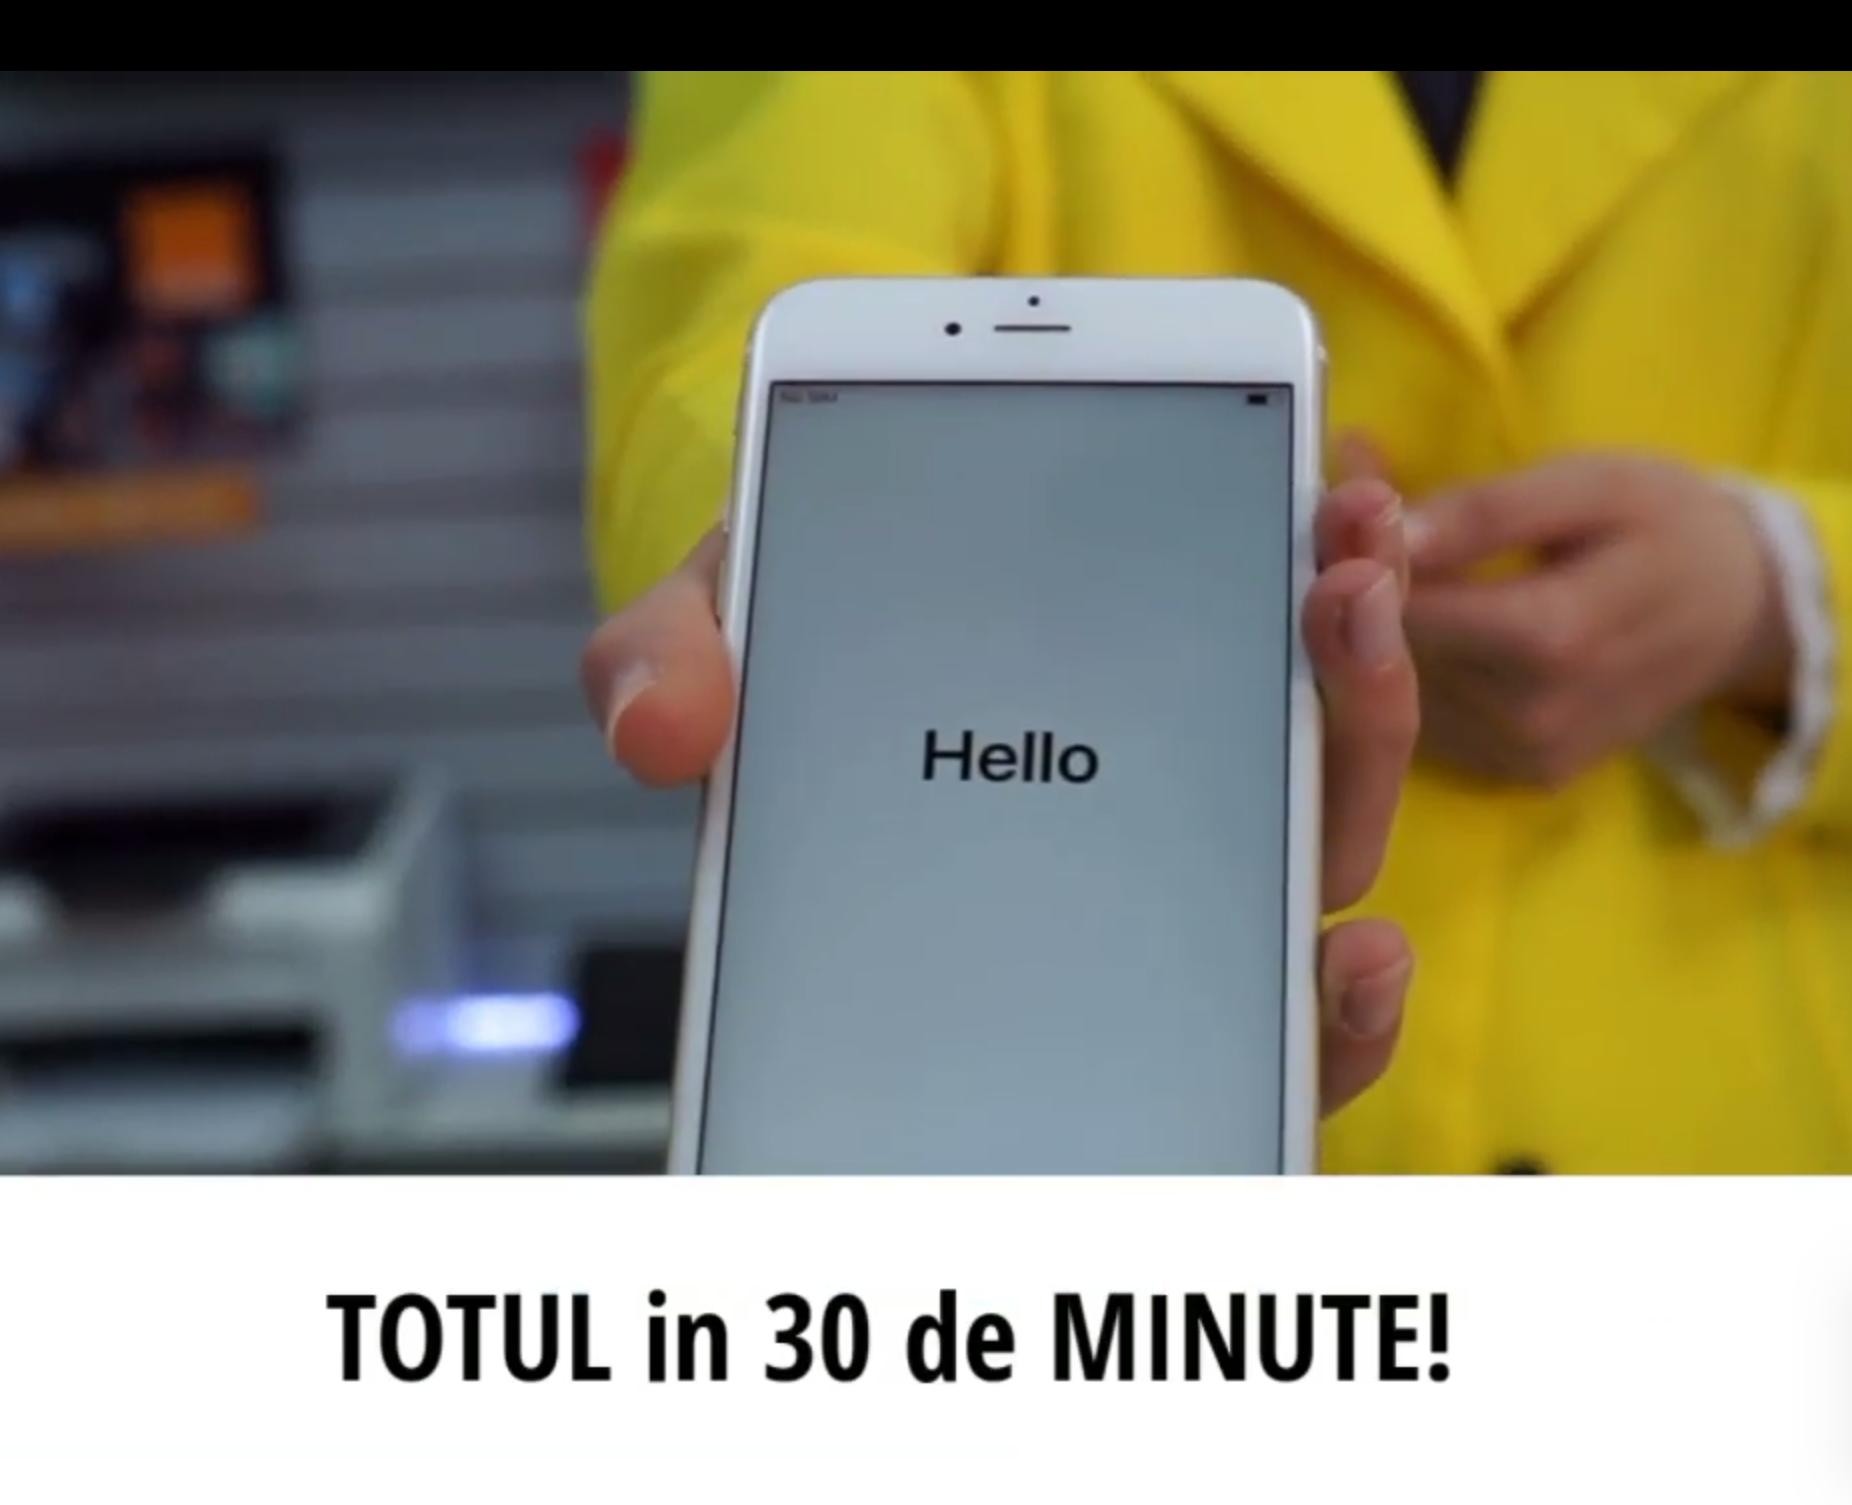 Reparam iPHONE in 30 min!